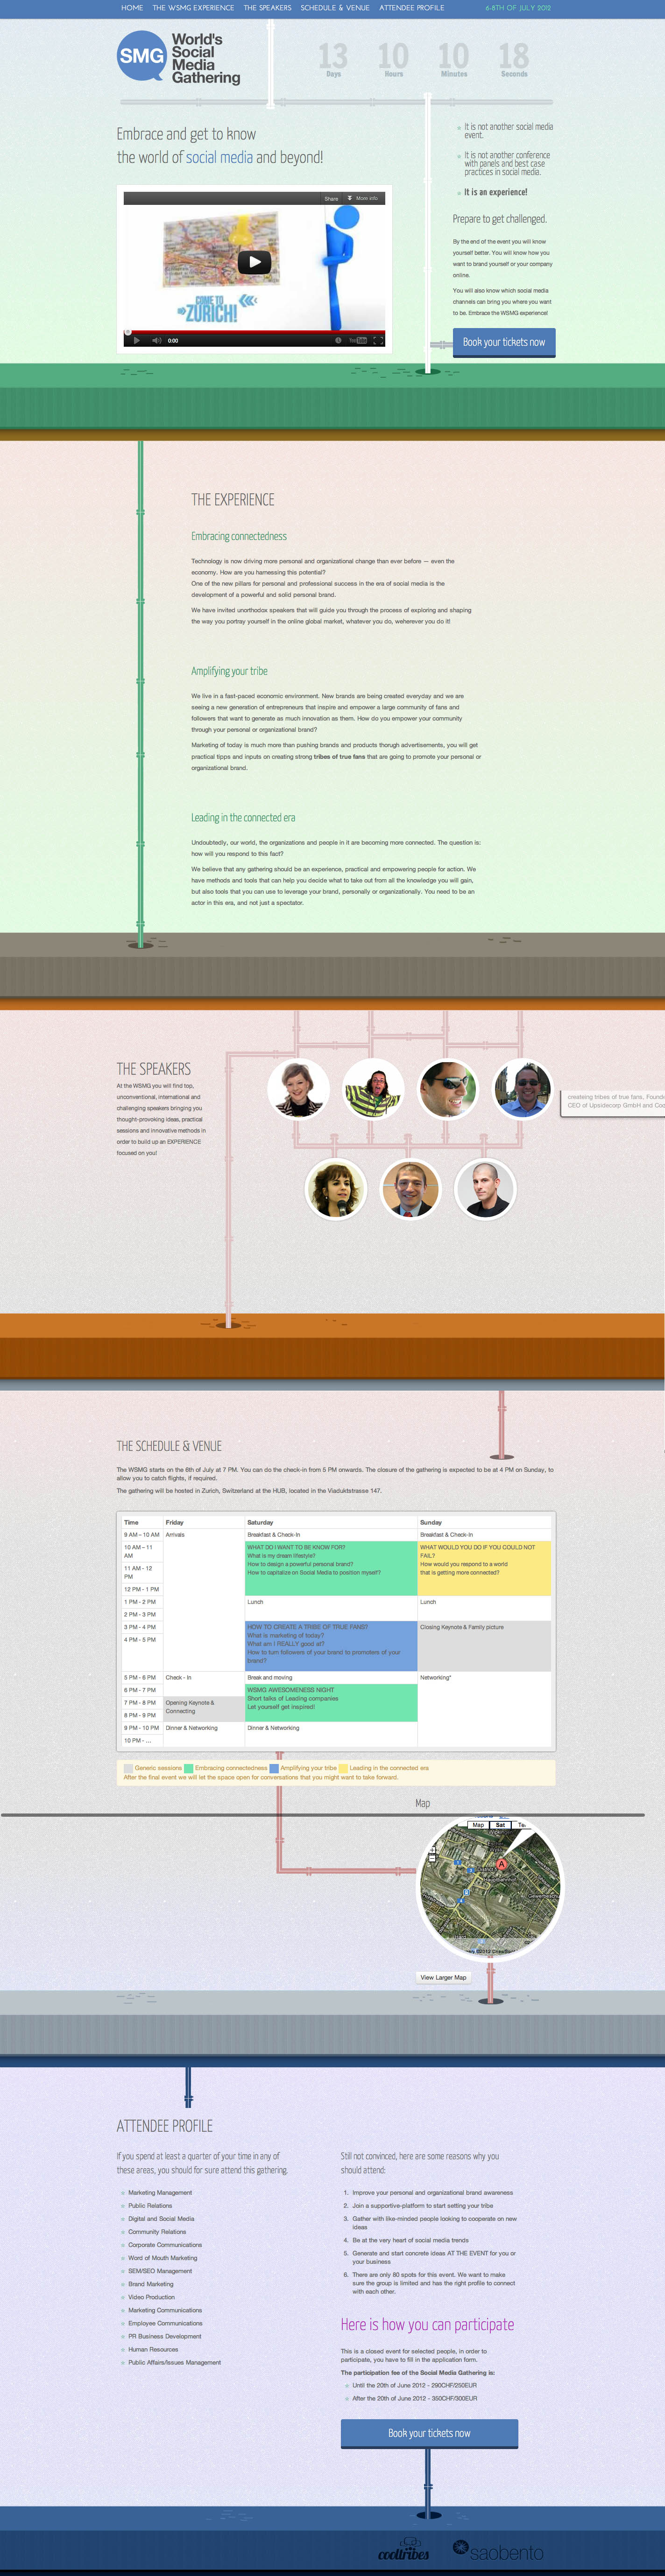 World's social media gathering Website Screenshot